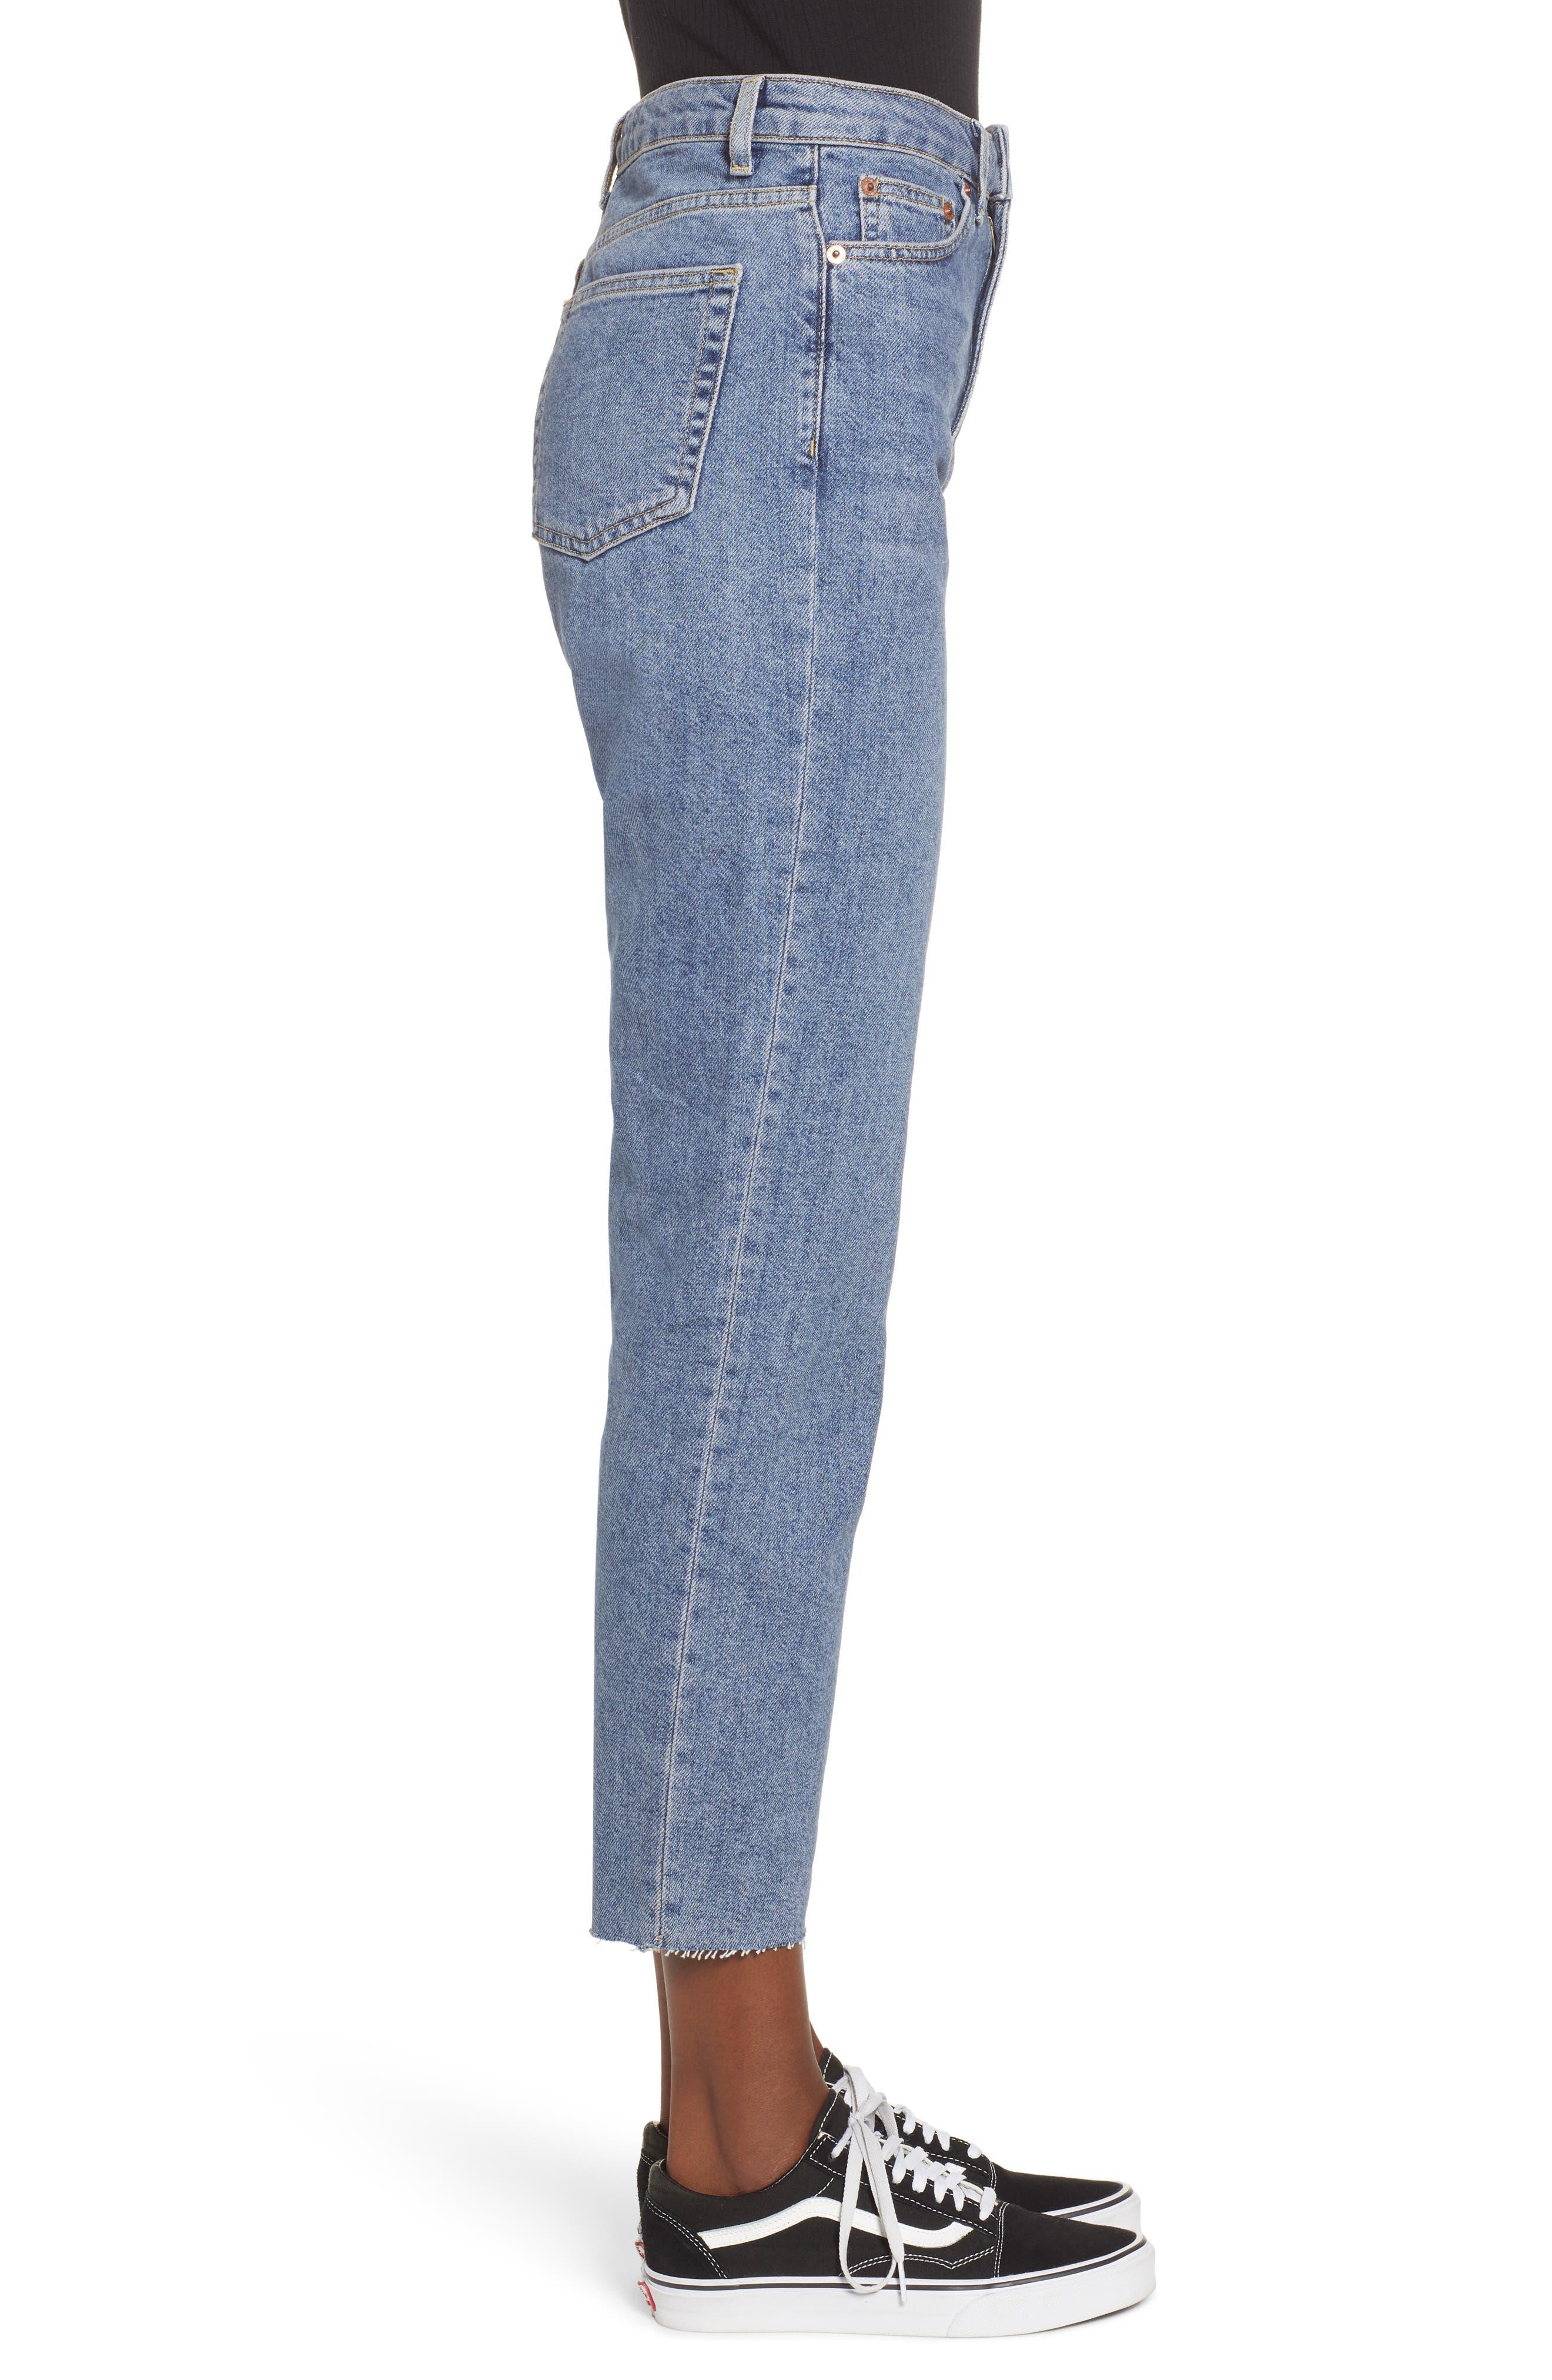 TOPSHOP, Raw Hem Straight Leg Jeans, Alternate thumbnail 4, color, MID BLUE